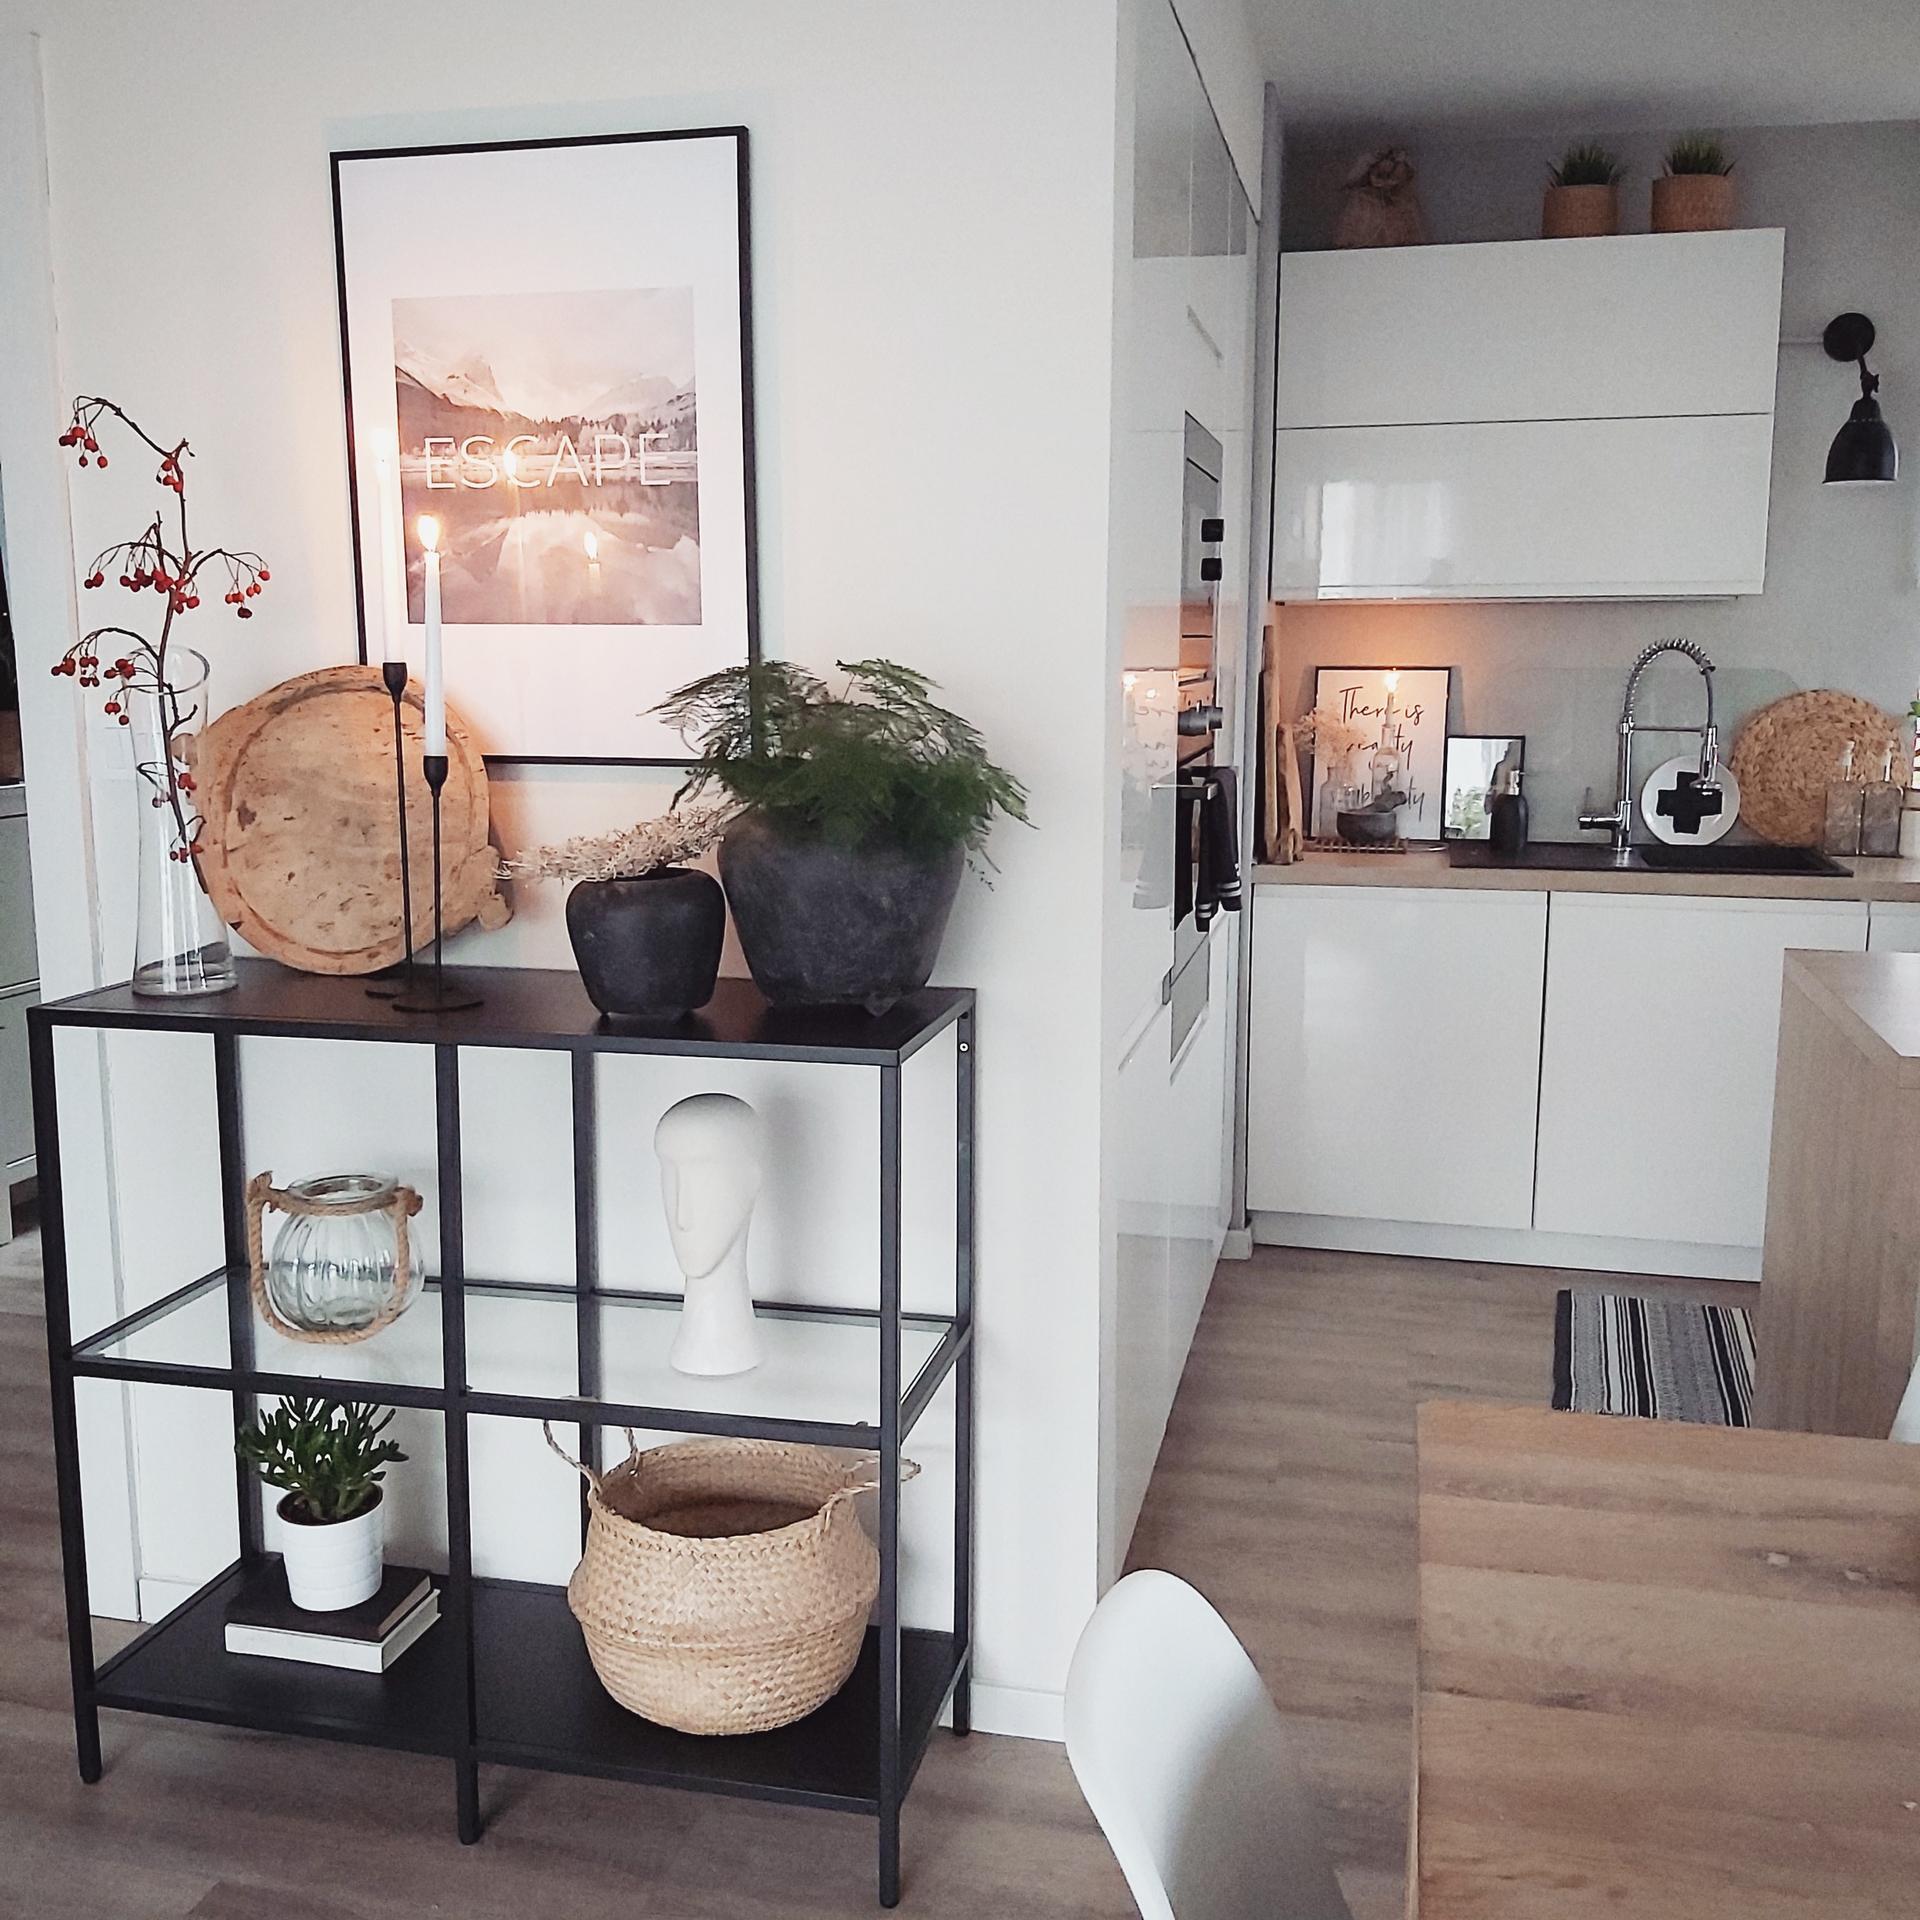 kuchyň - Obrázek č. 3